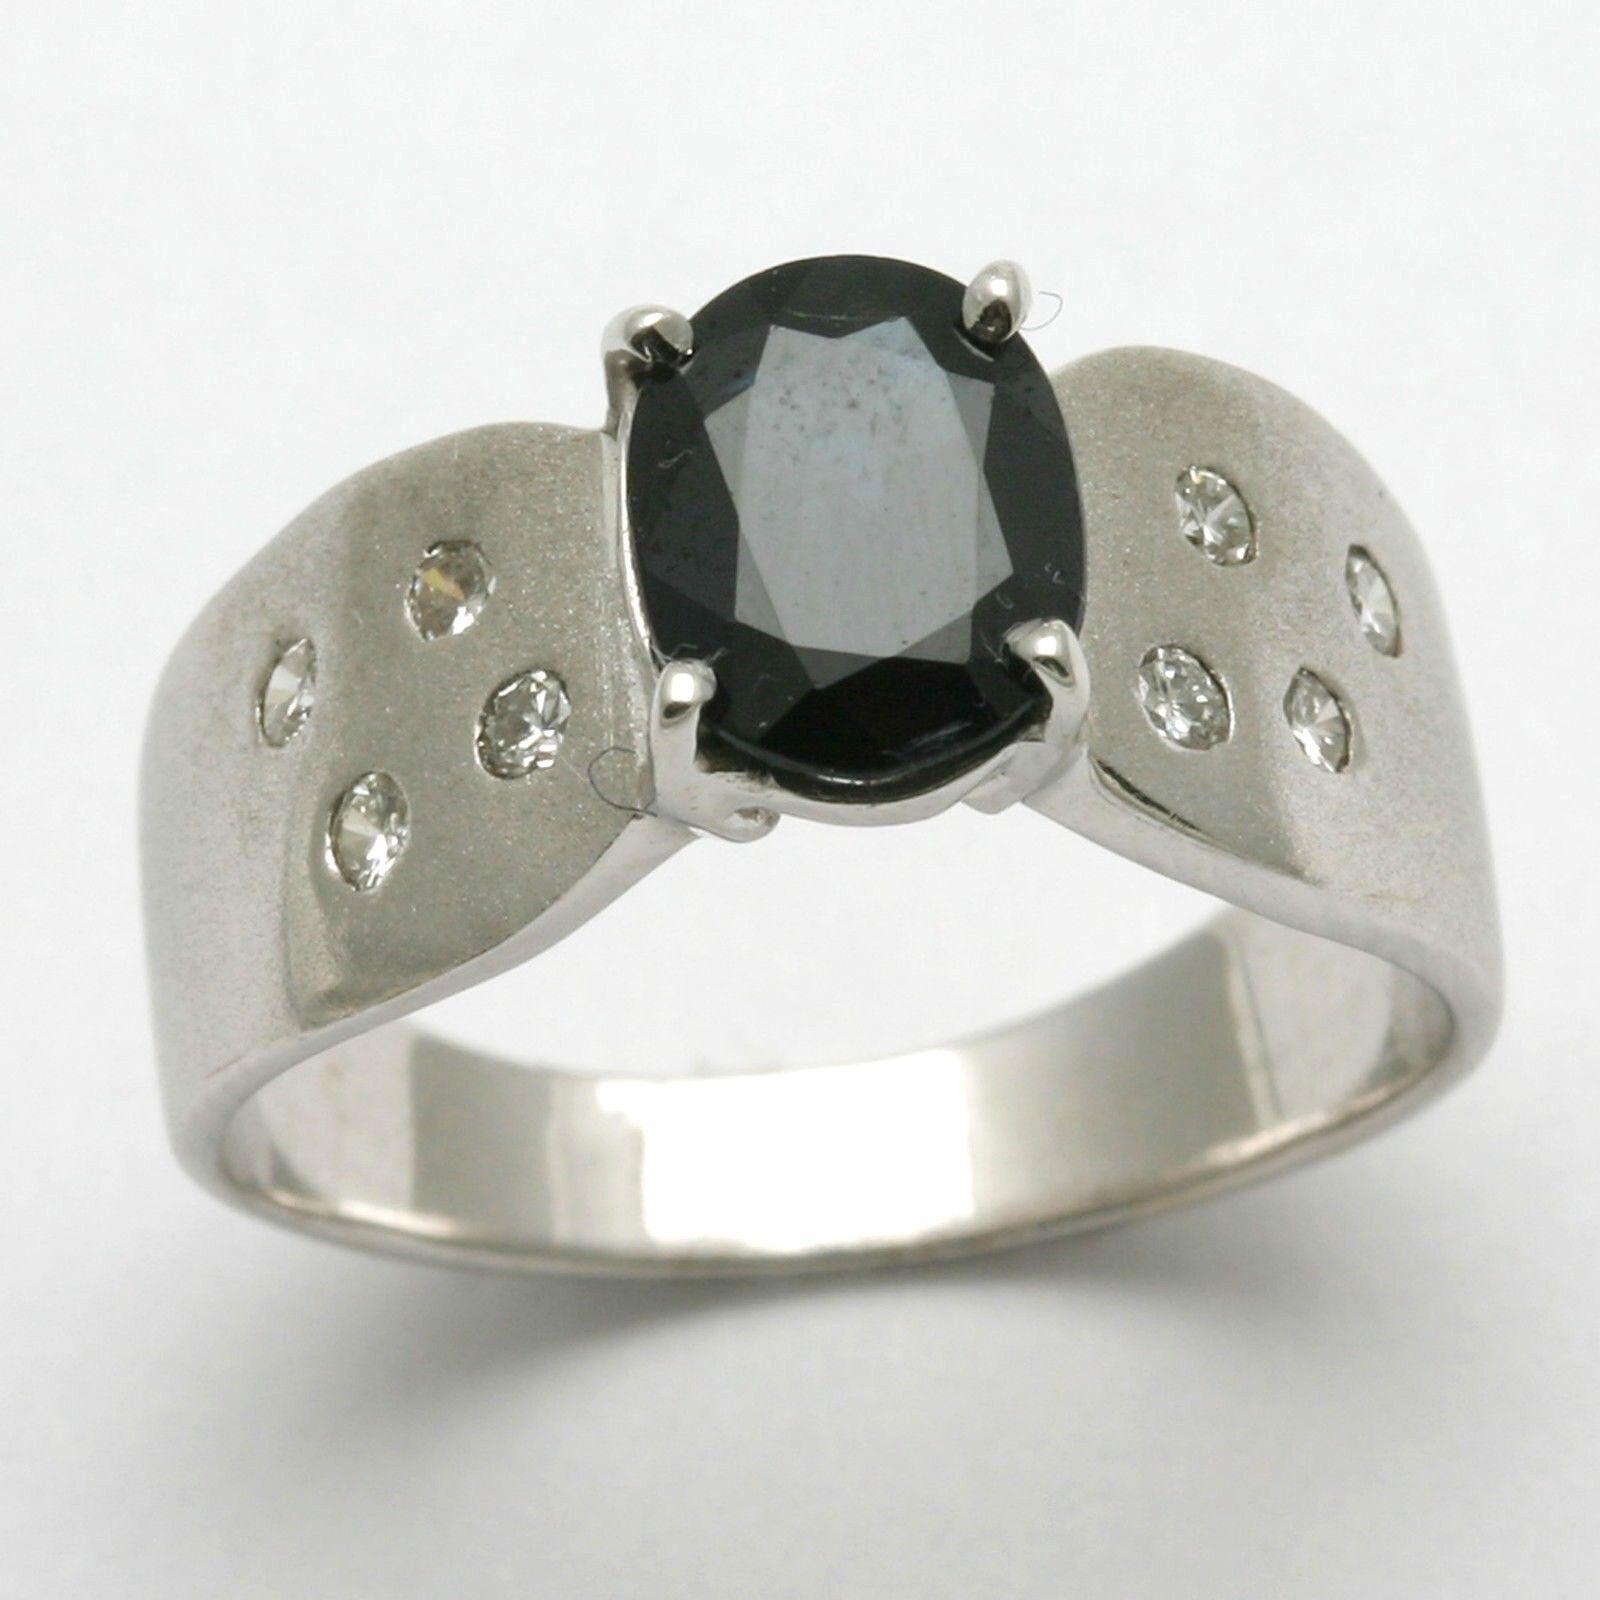 bluee Sapphire & Diamond Ring Modern Oval 14k white gold NEW